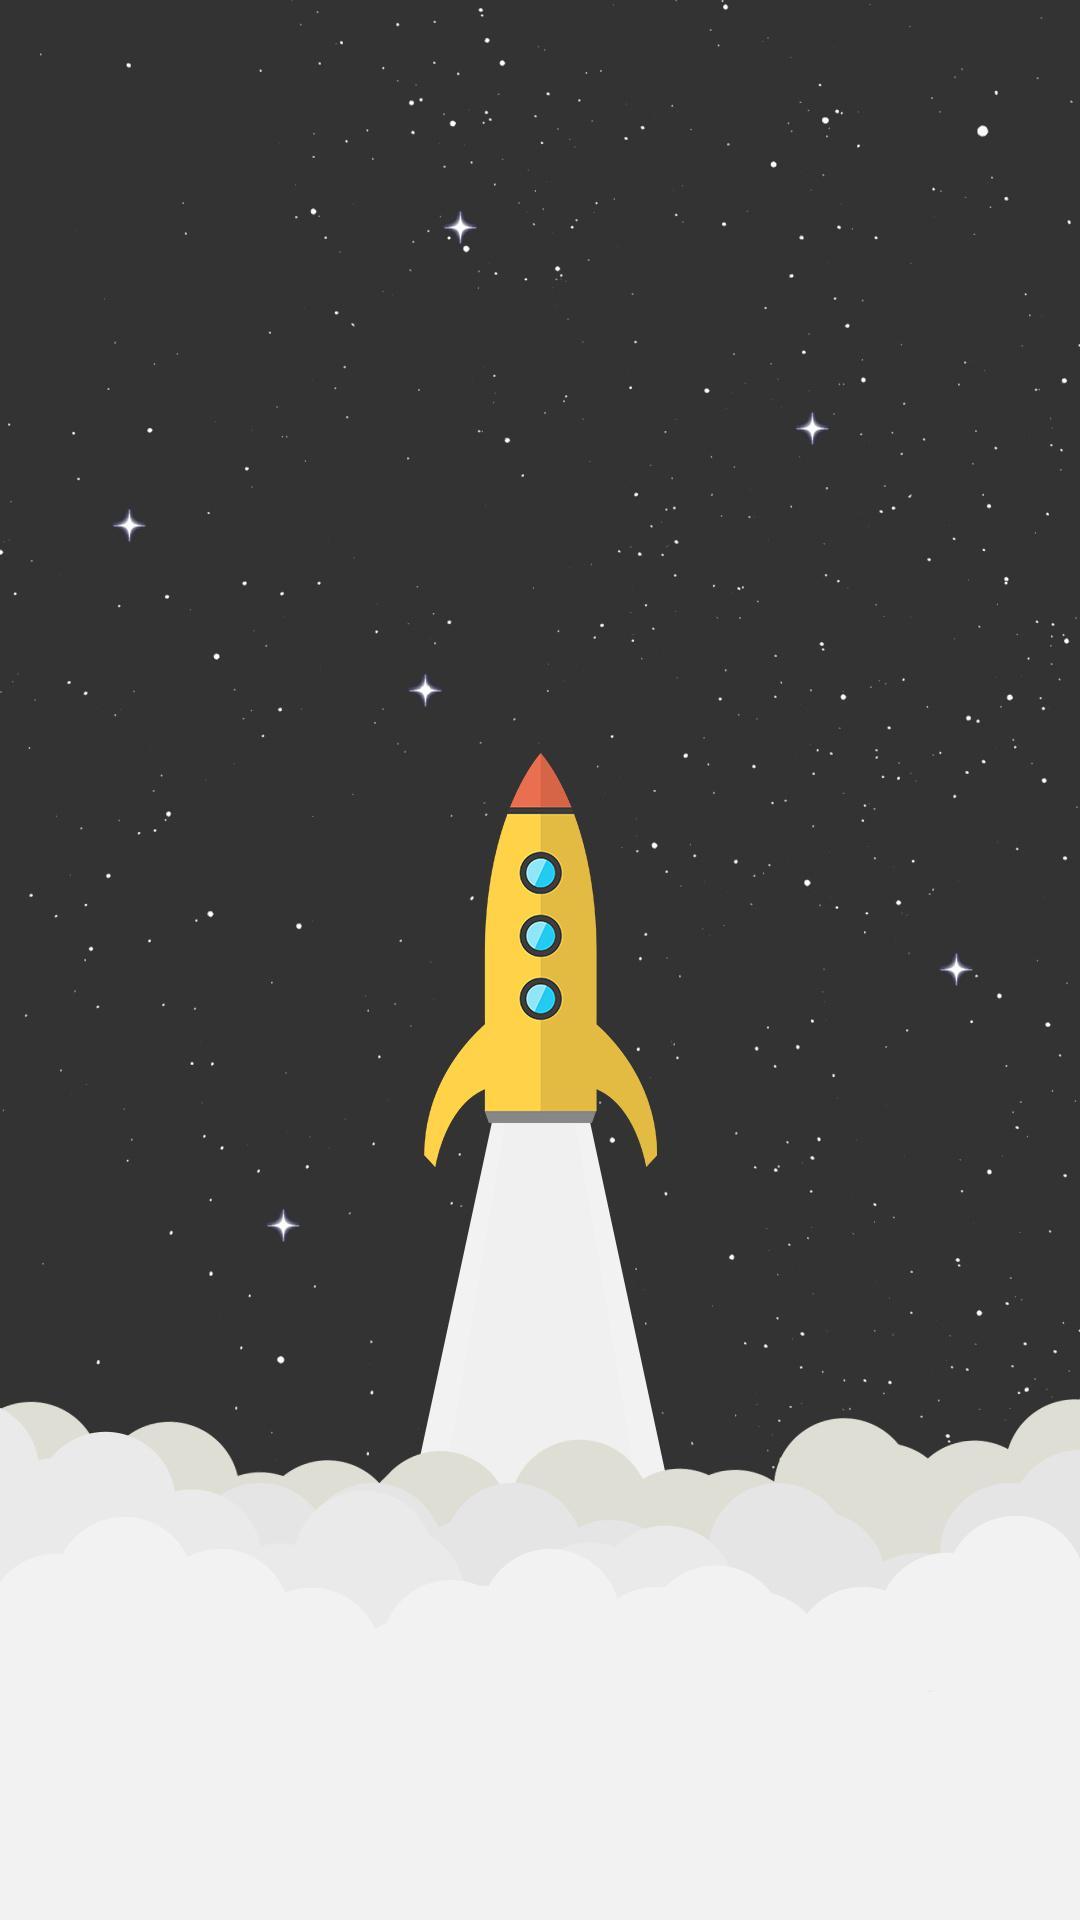 Rocket Space Minimal Background Hd Wallpaper